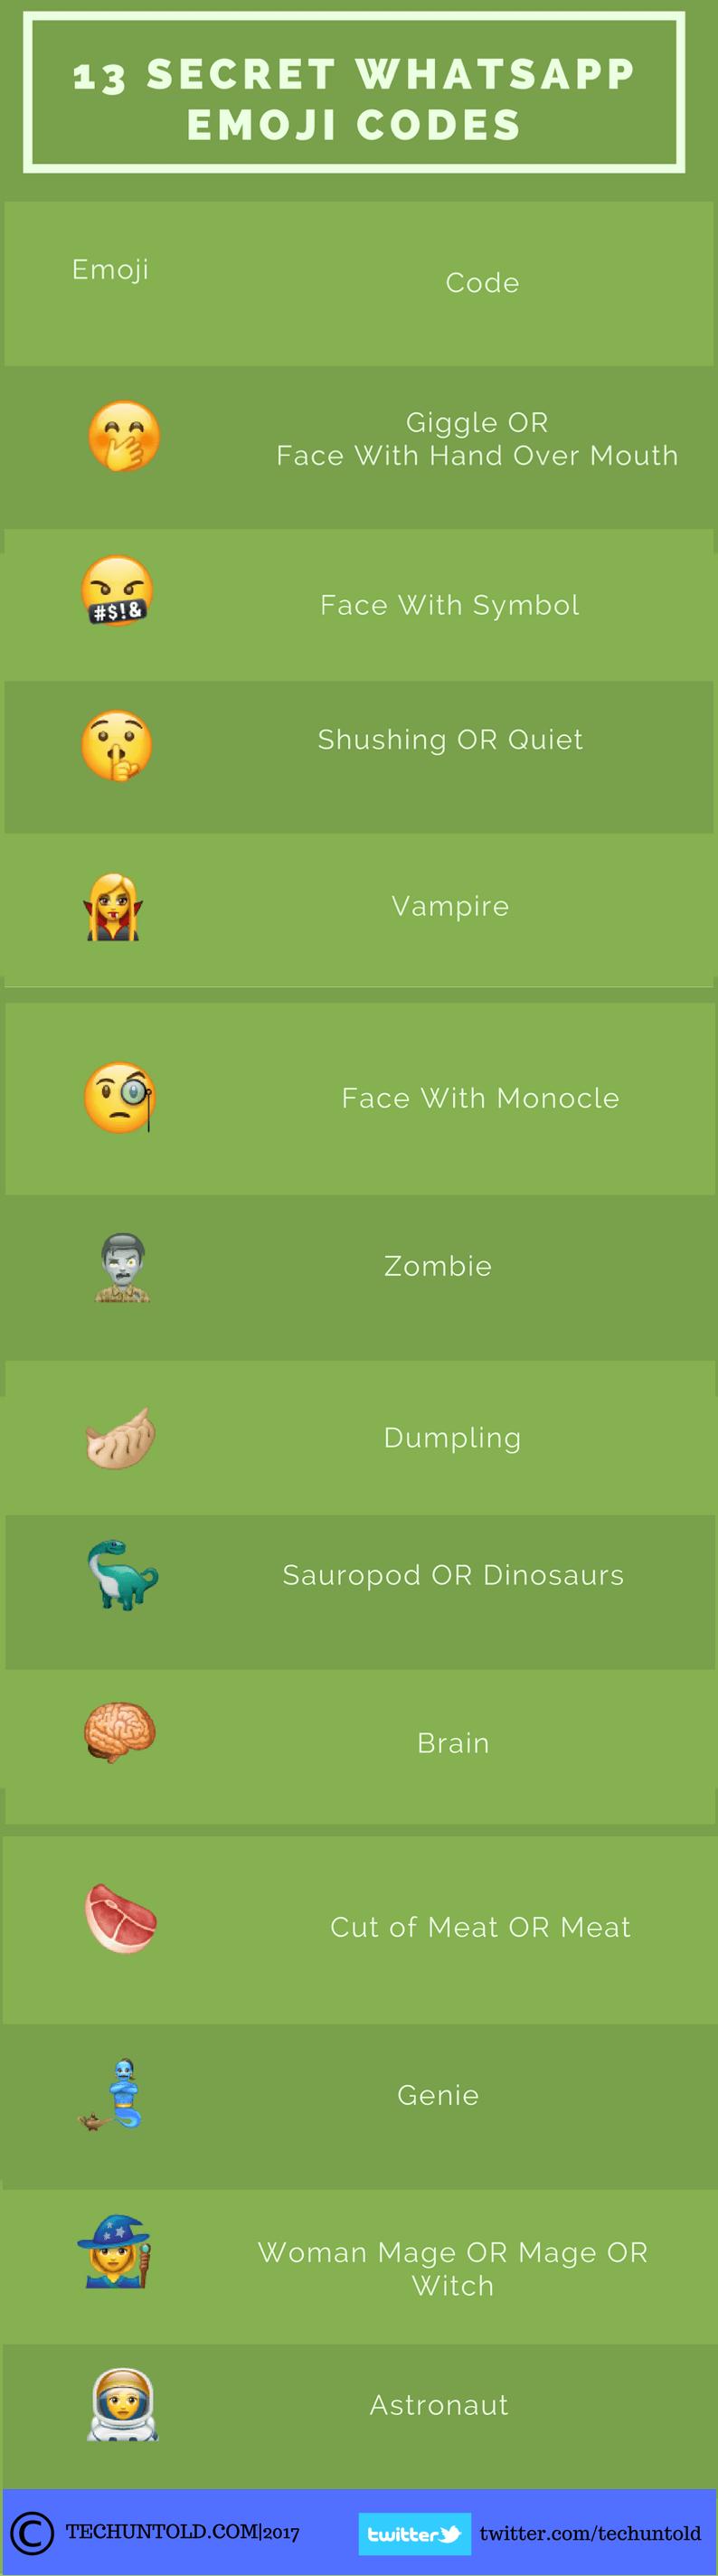 secret whatsapp emoticons